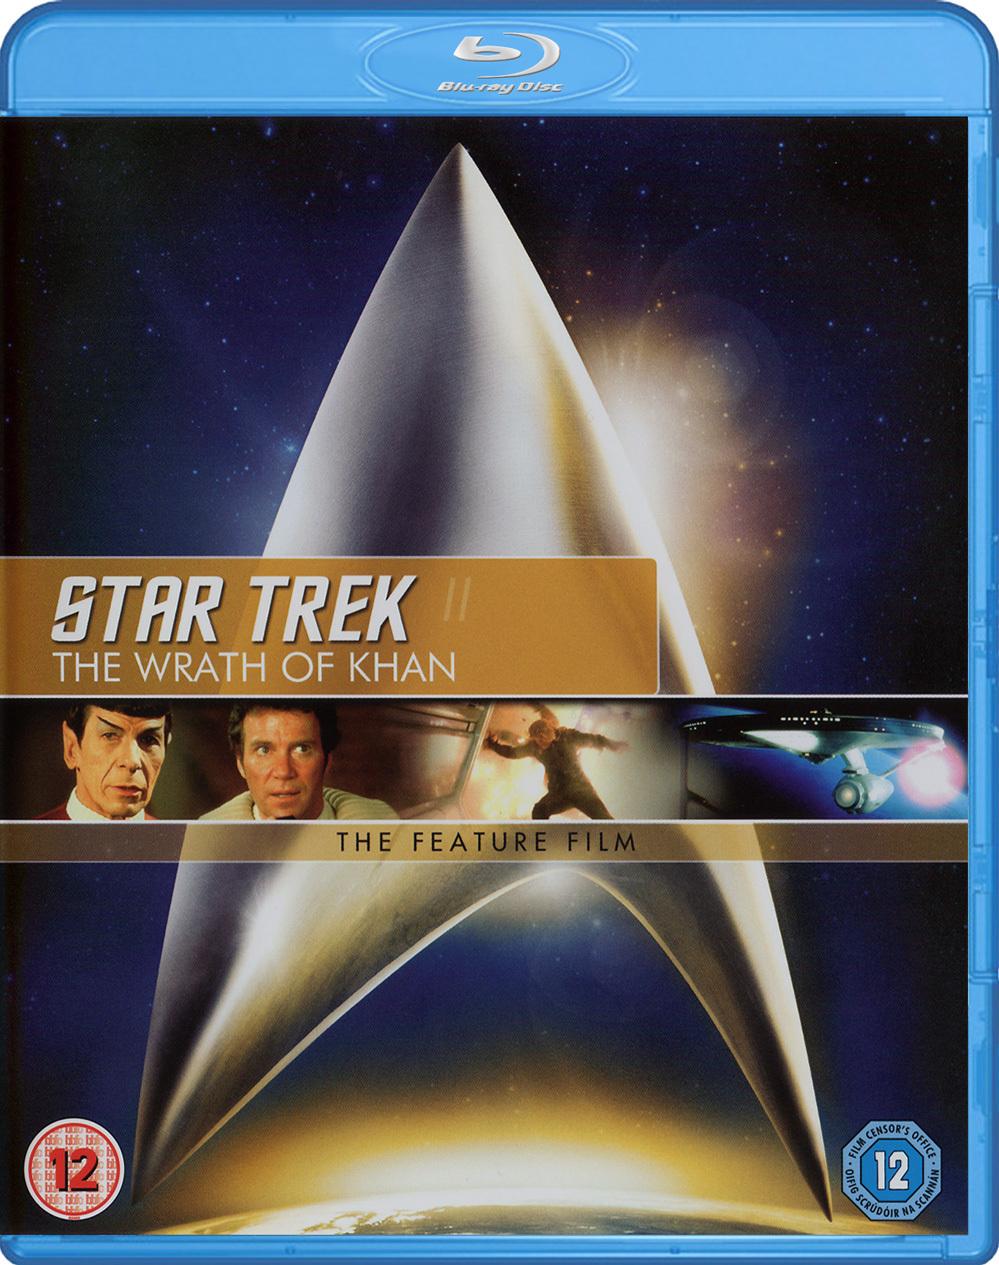 Star Trek II The Wrath of Khan Blu-ray cover Region B